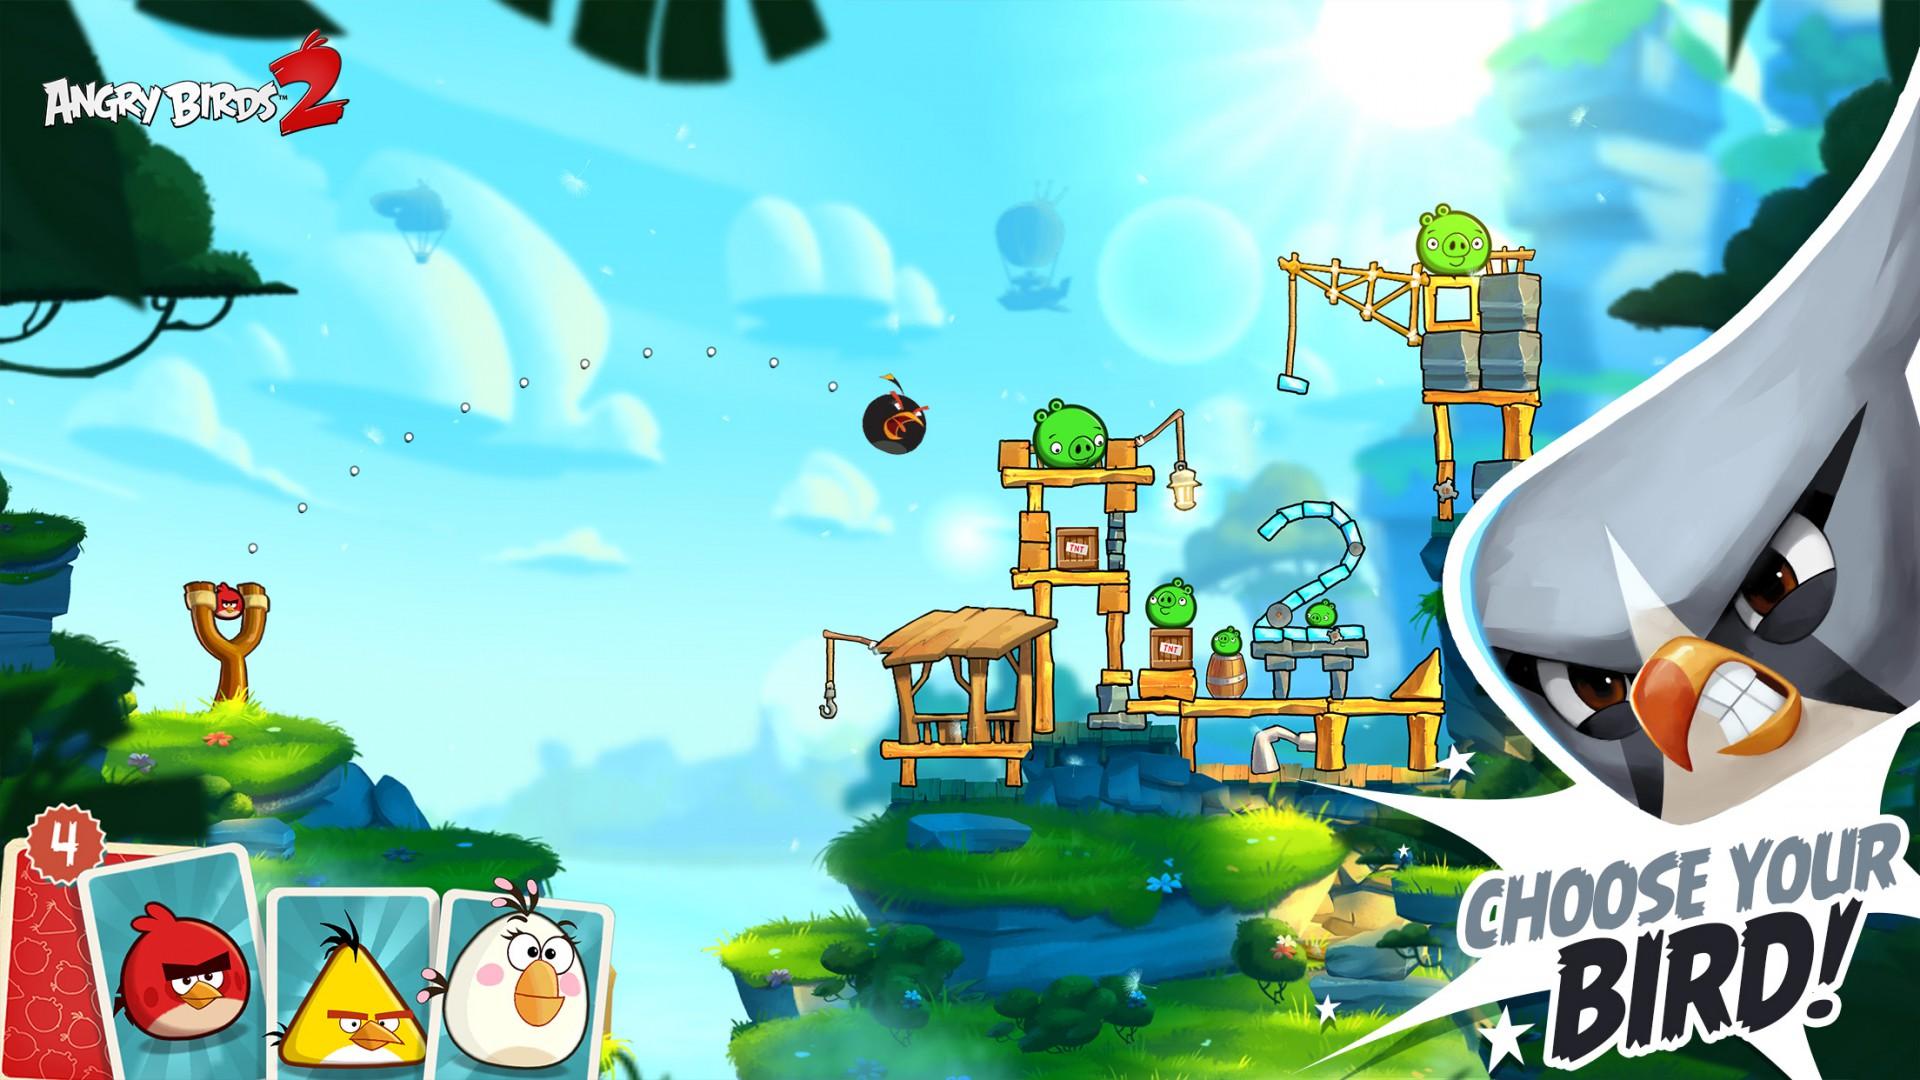 angry_birds_2_screenshot_choose_your_bird.jpg